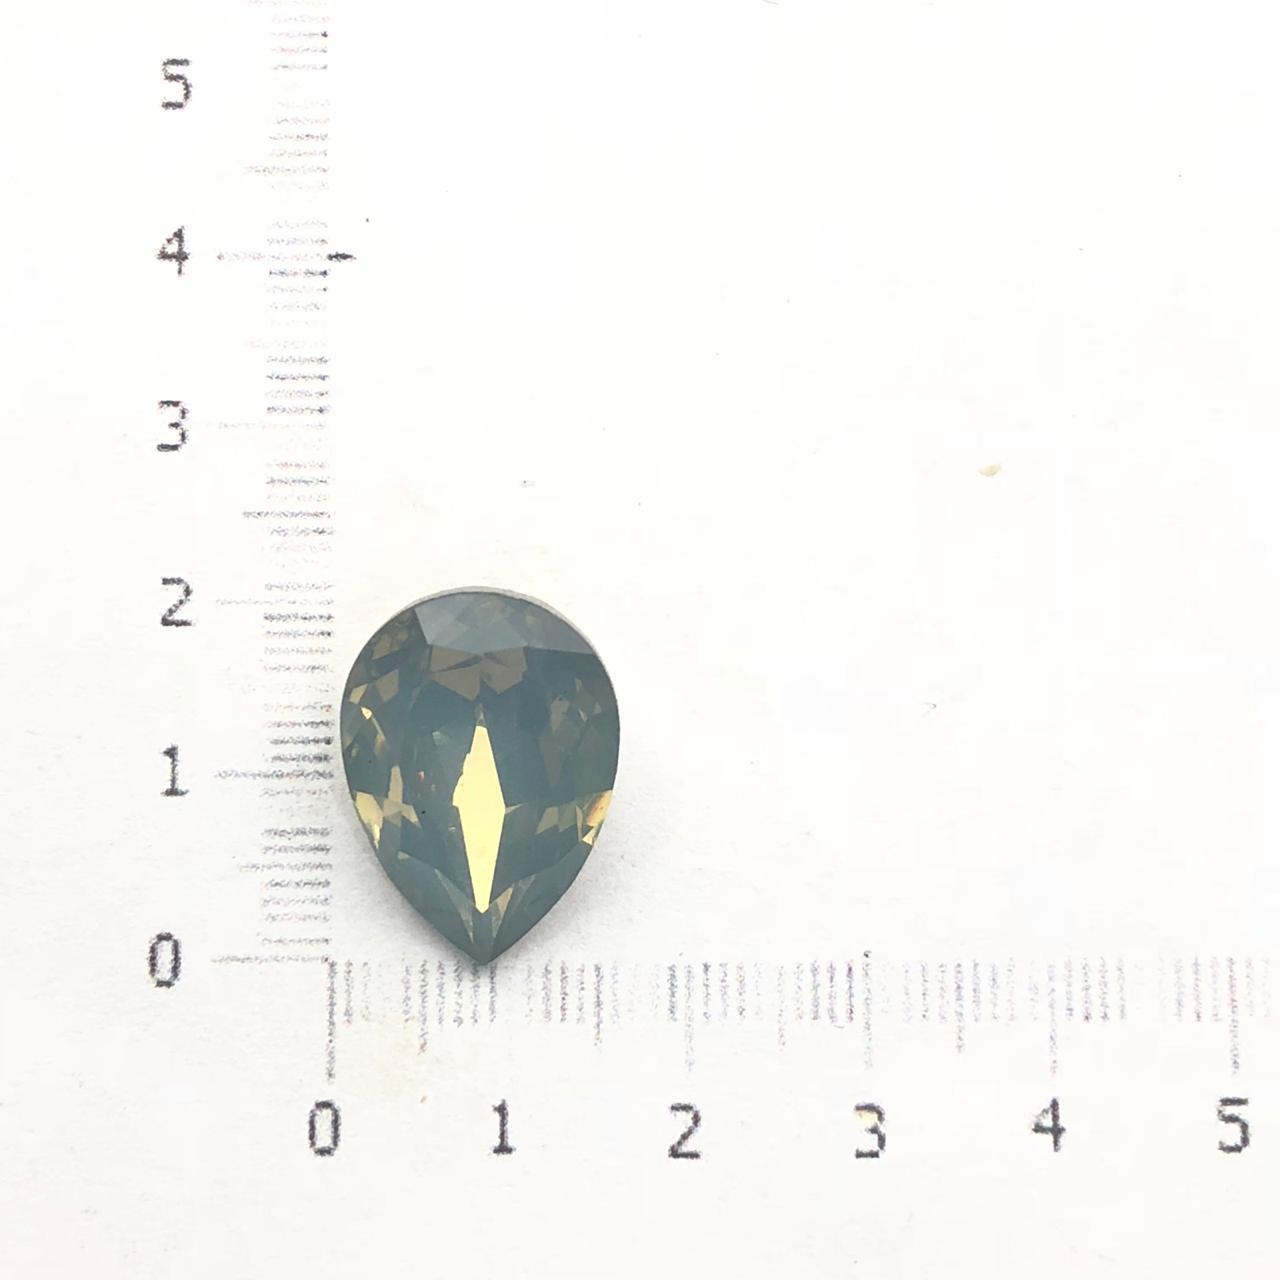 CHT721 - Chaton Gota 13x18 Base Côncava Indian Sapphire - 2unids